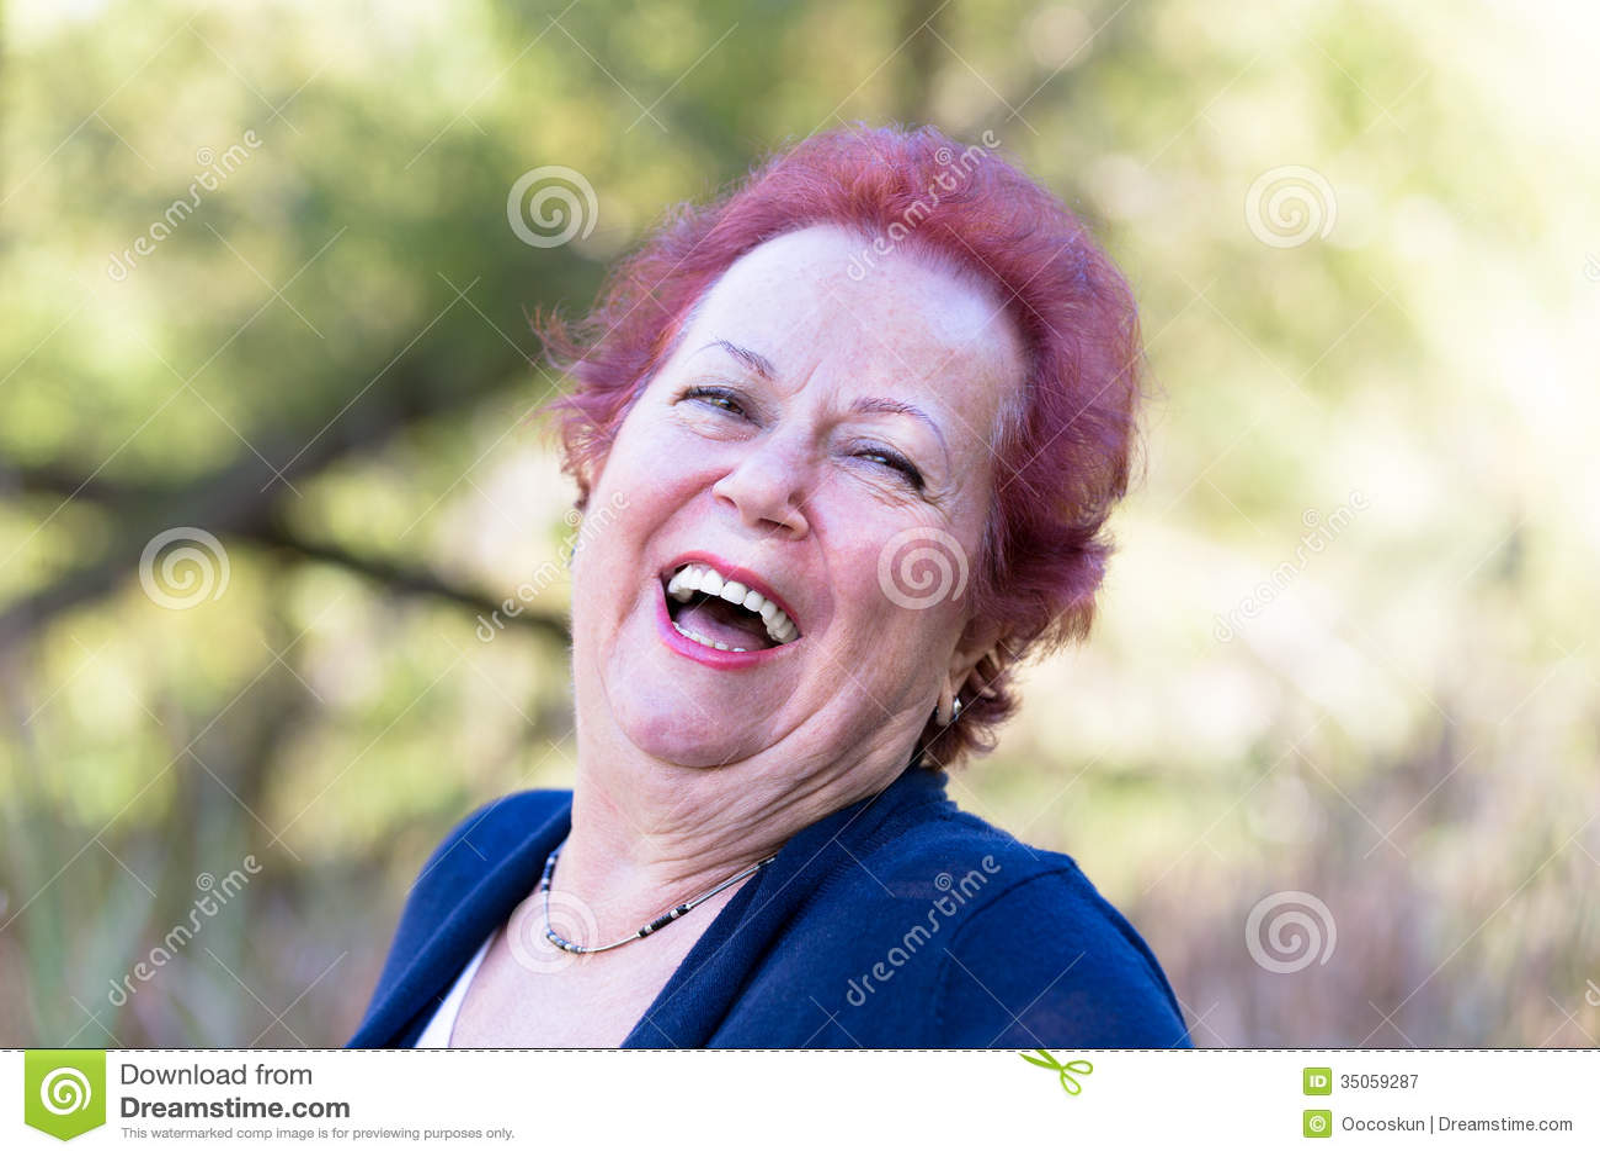 Enthusiastic Senior Woman Giving a Genuine Laugh